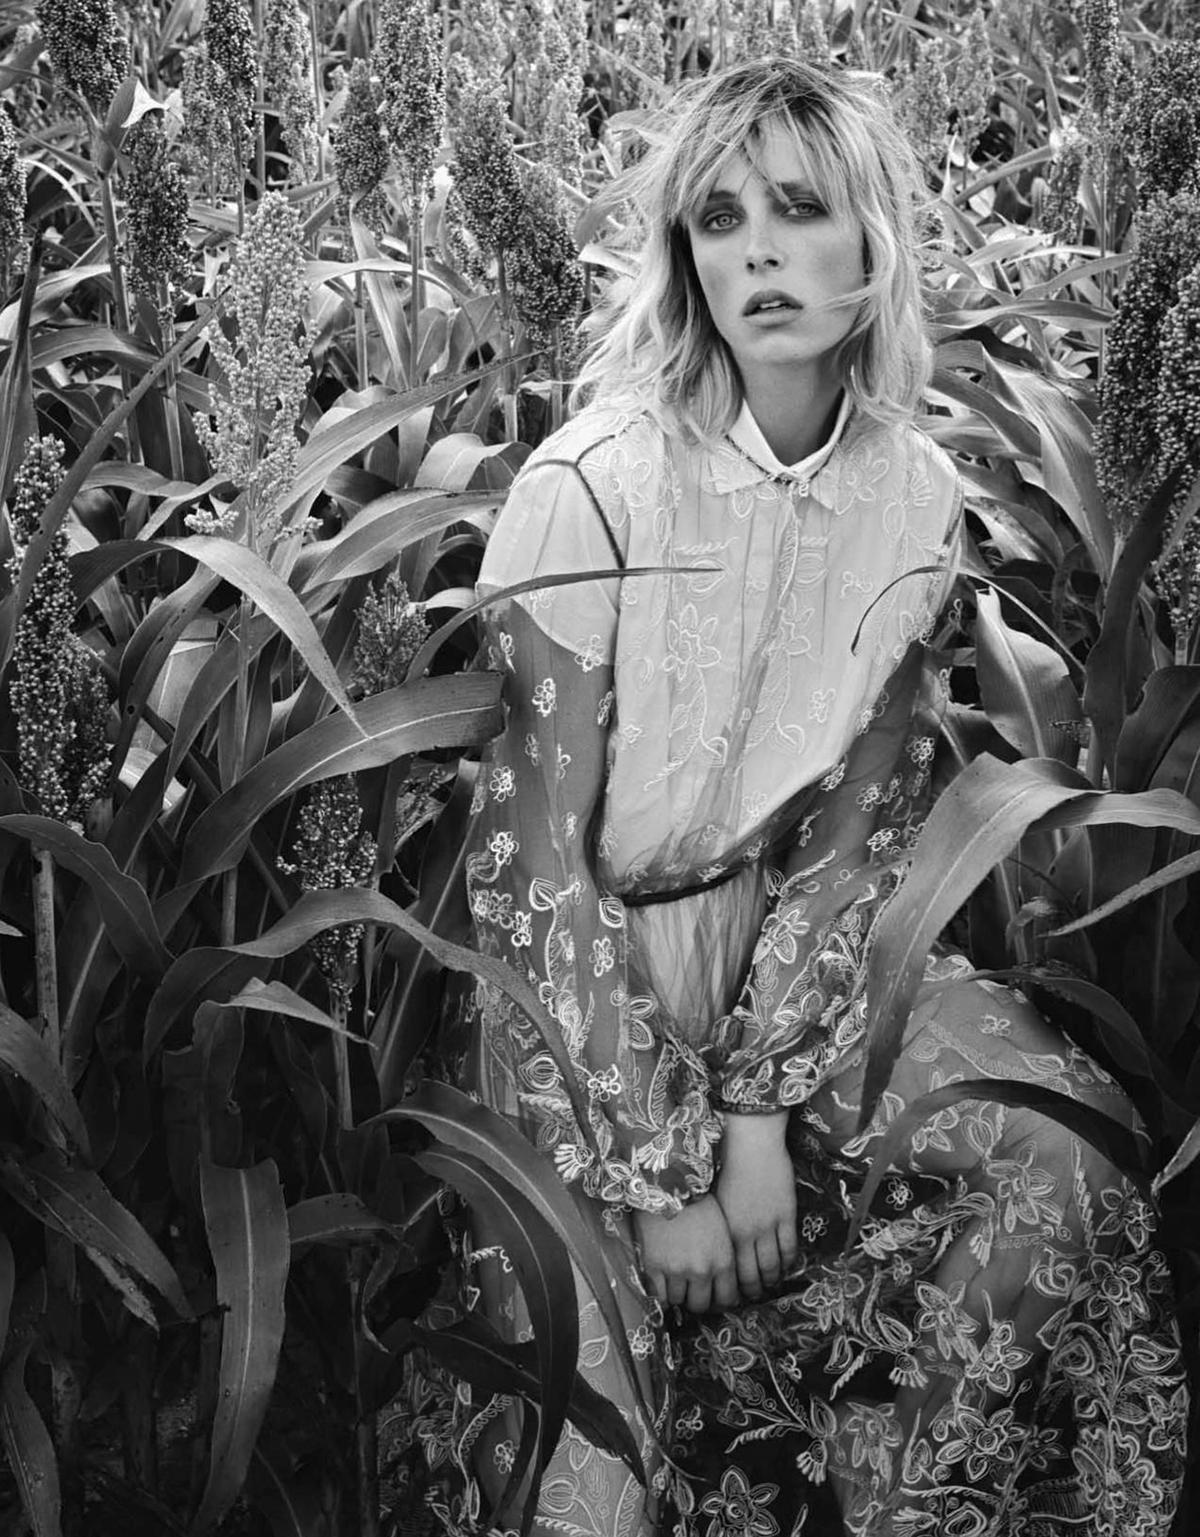 Edie-Campbell-Patrick-Demarchelier-Vogue-China-Dec-2017- (7).jpg